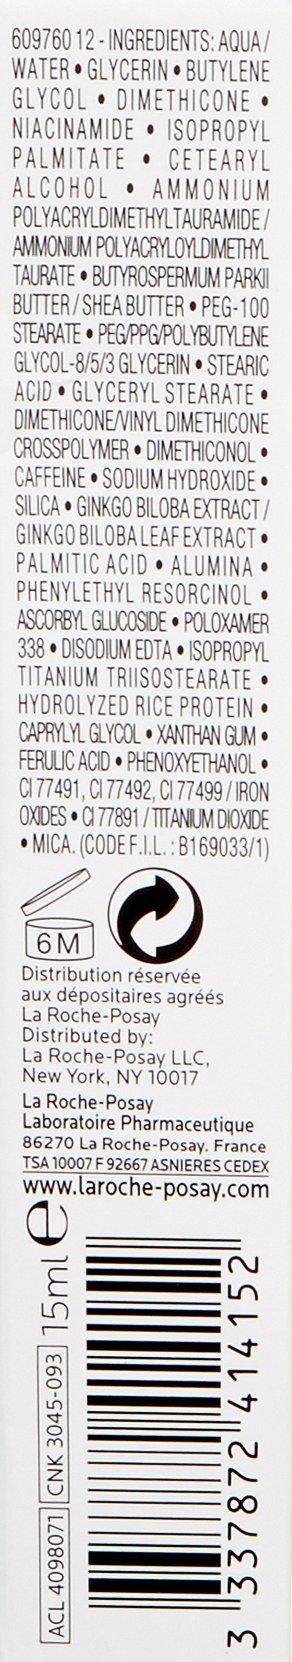 La Roche-Posay Pigmentclar Dark Circles Eye Cream, 0.5 Fl. Oz. by La Roche-Posay (Image #4)